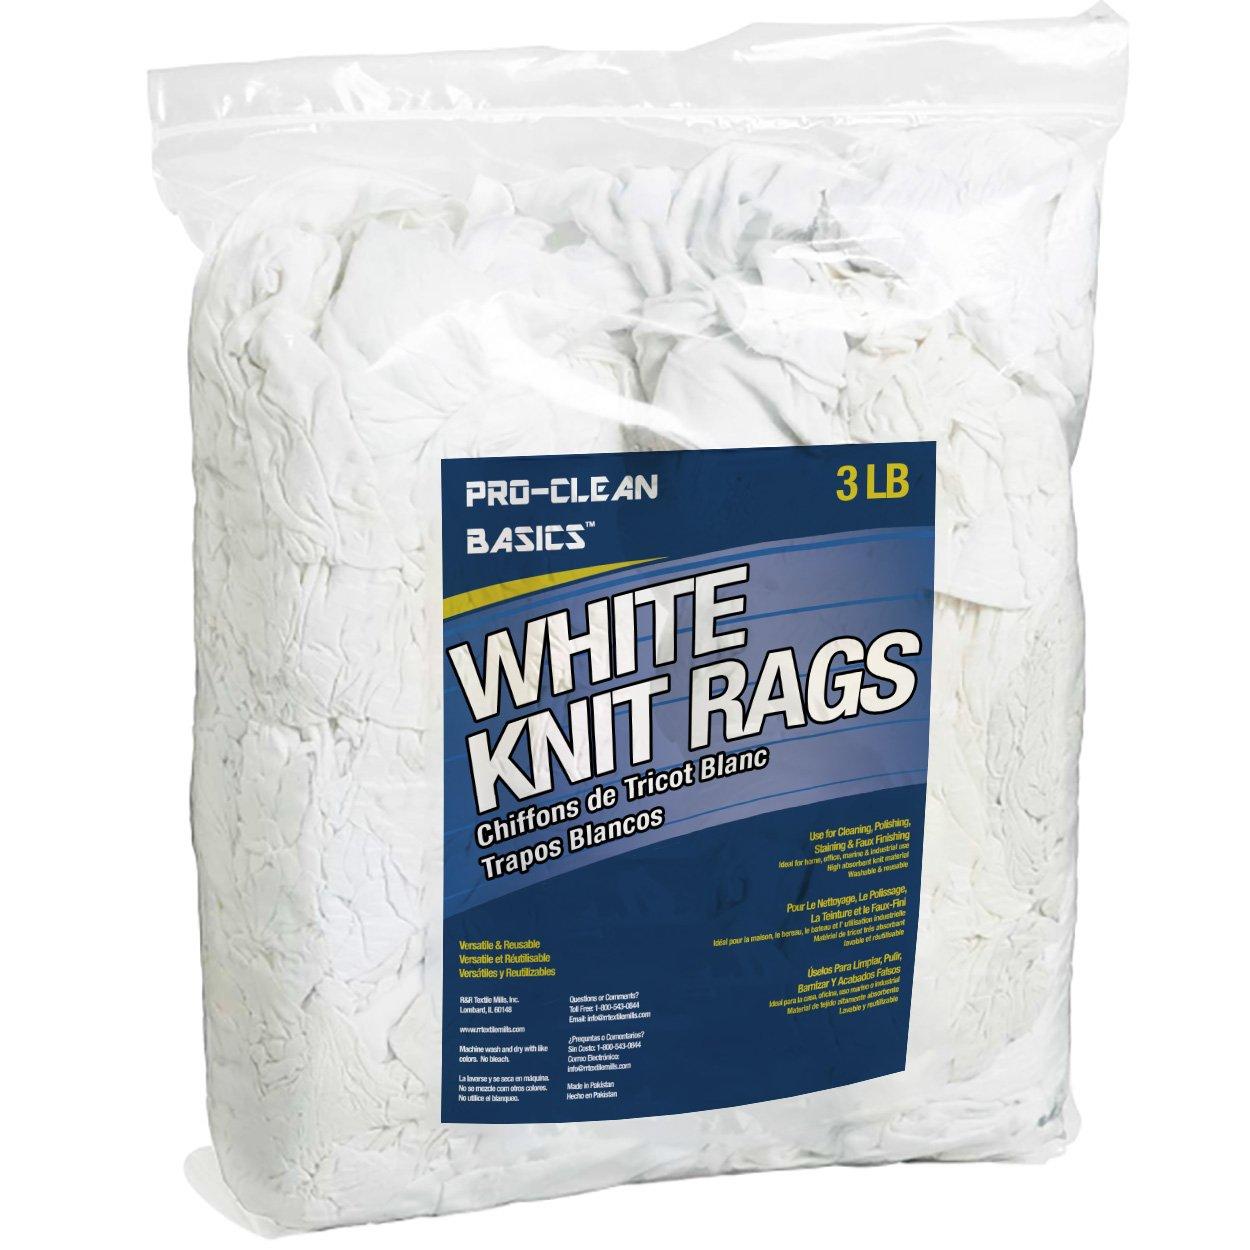 Pro-Clean Basics White T-Shirt Cloth Rags: 3 lb. Bag